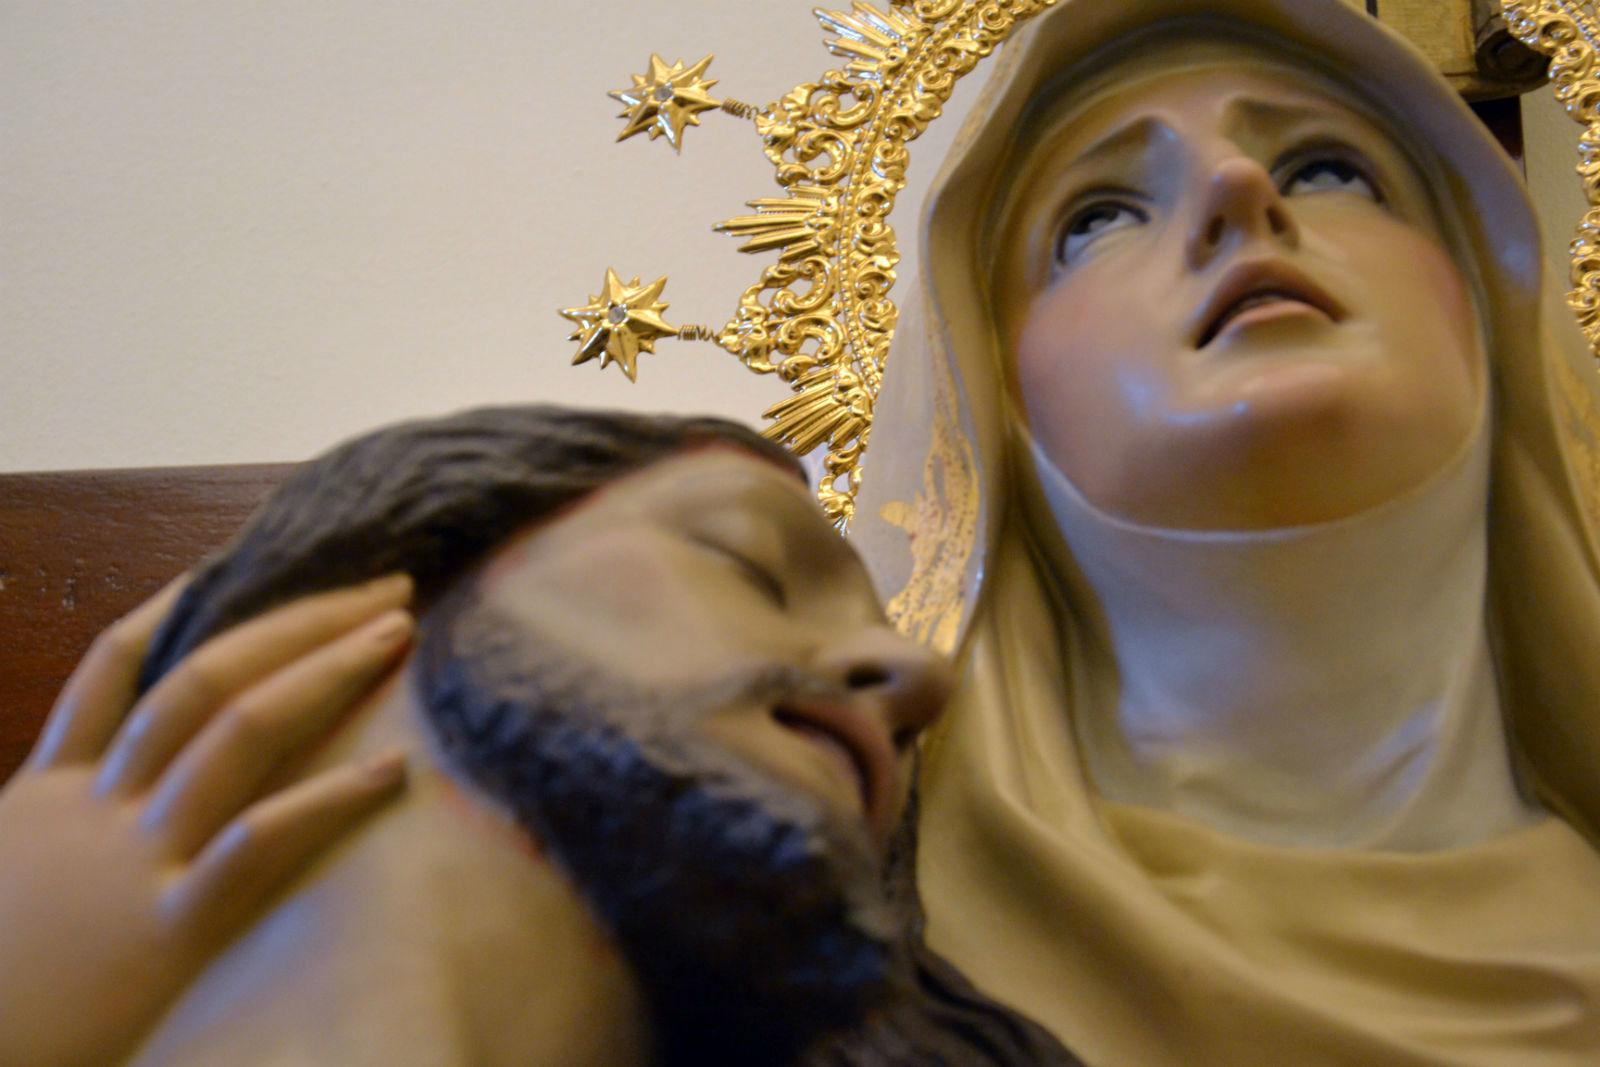 parroquia-san-esteban-portomartir-fuenlabrada-virgen